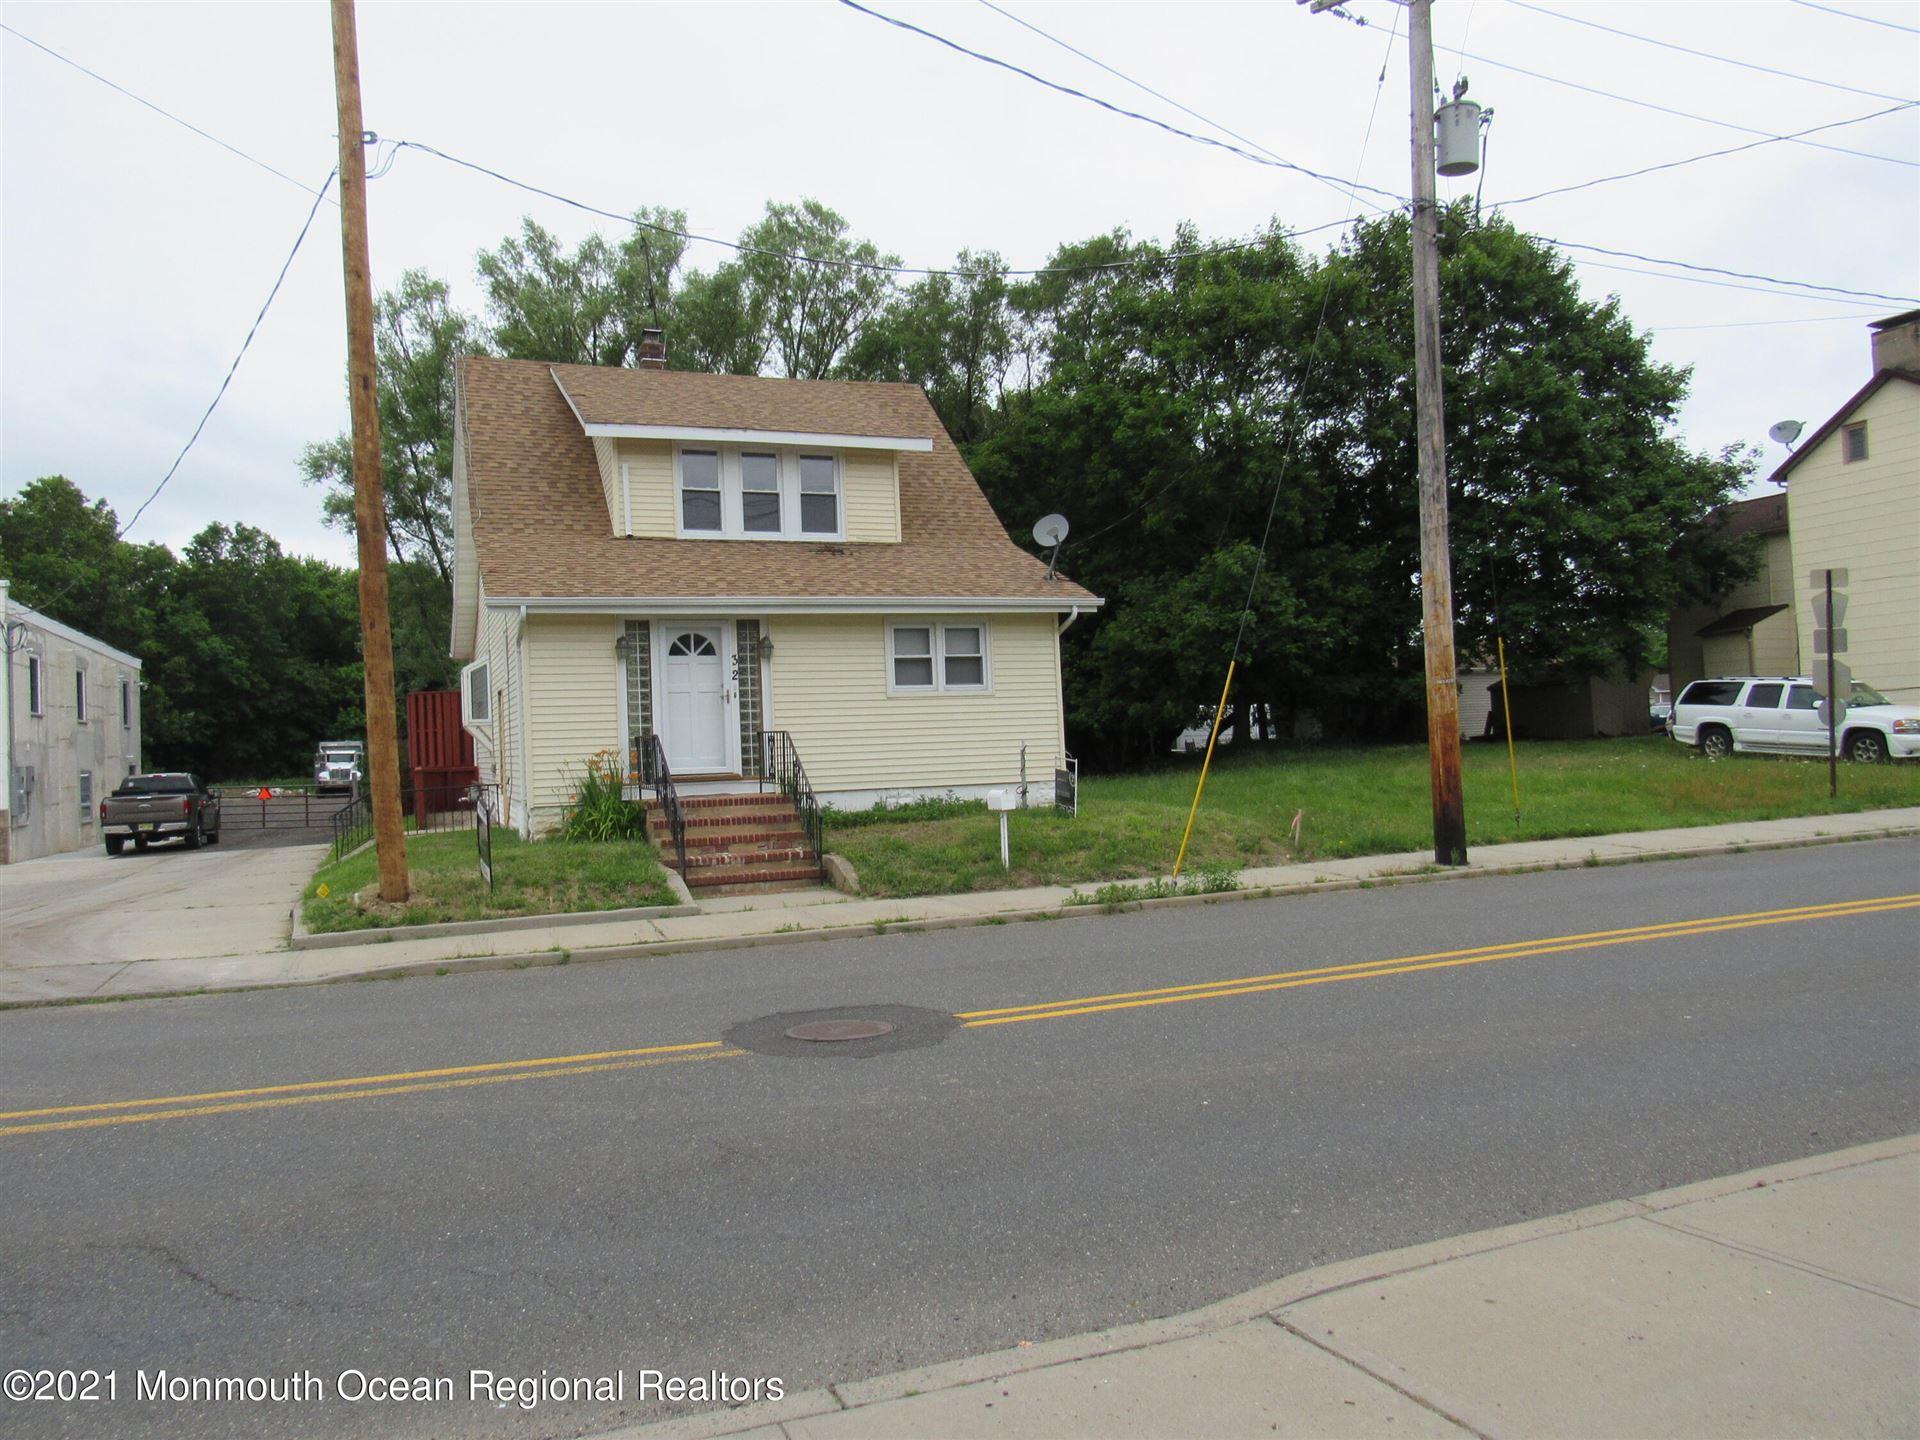 32 Water Street, Englishtown, NJ 07726 - MLS#: 22123318